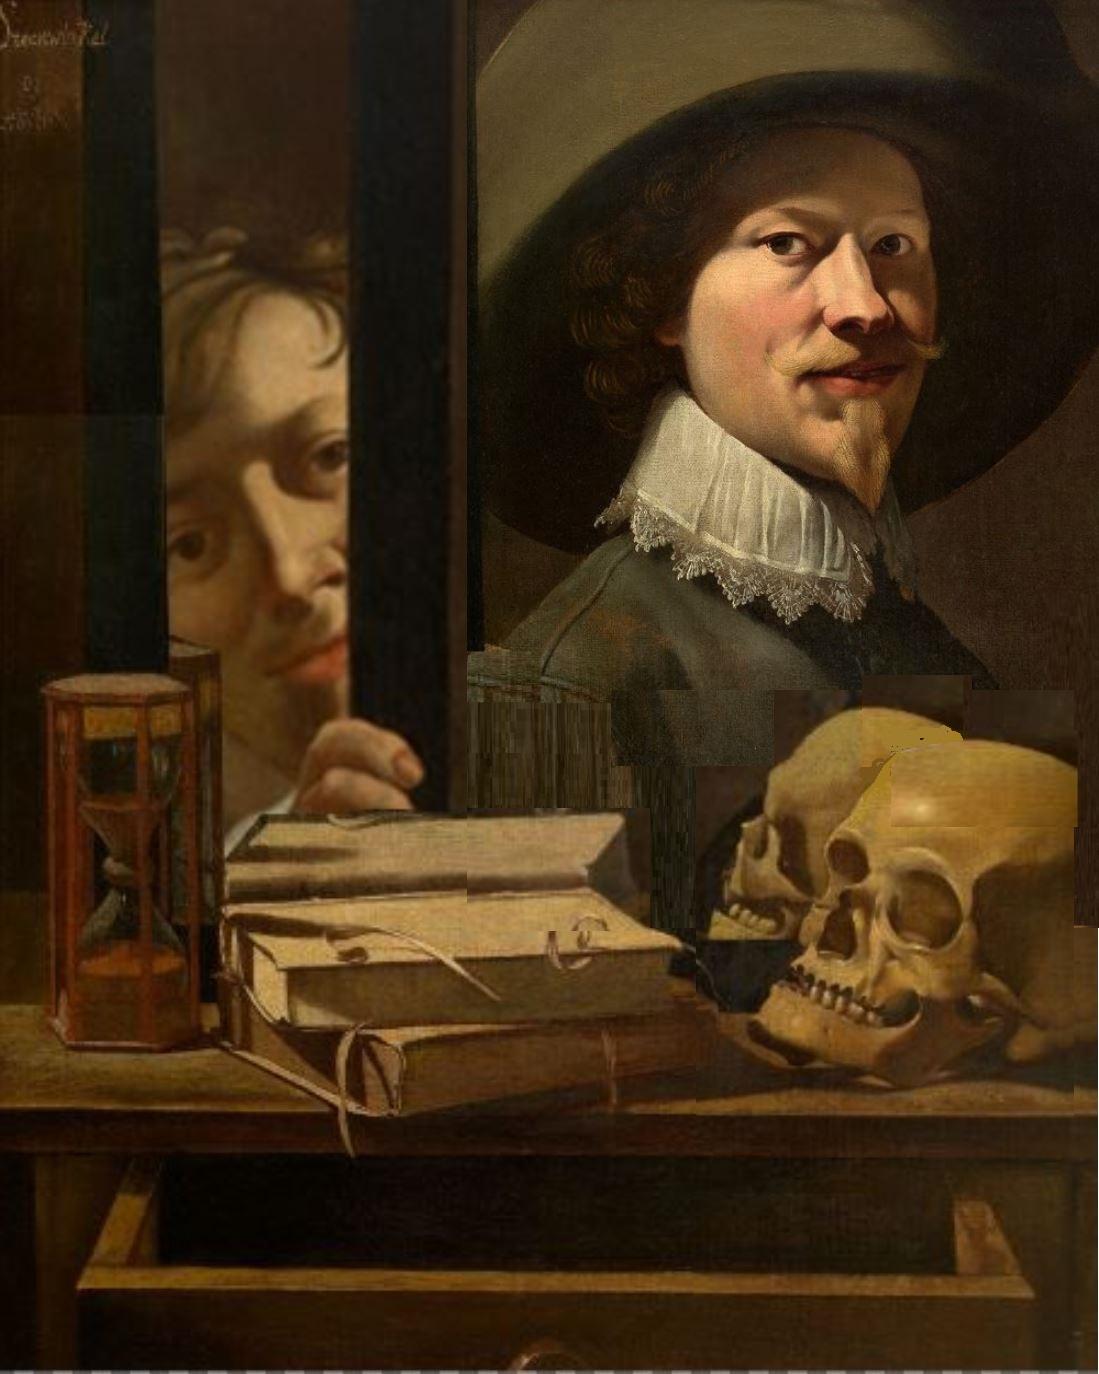 Antoine Steenwinkel - Vanitas, portrait de l artiste, XVIIeme s. Royal Museum of Fine Arts Antwerp solution